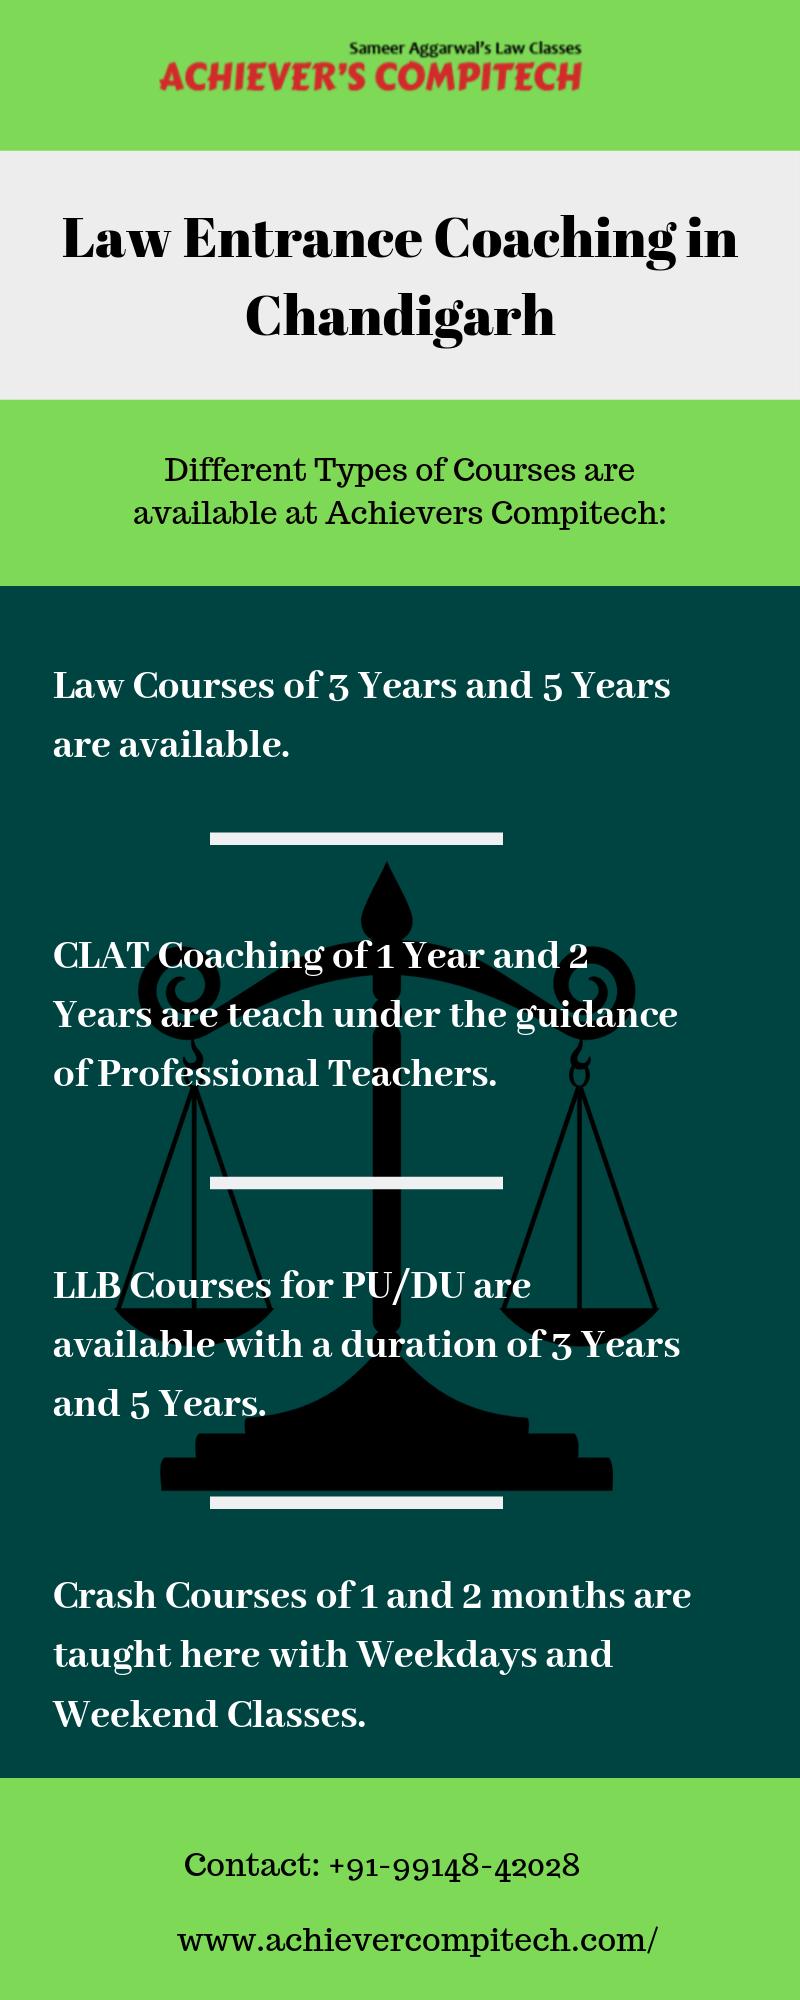 Top Clat Coaching In Chandigarh Law Courses Teaching Crash Course